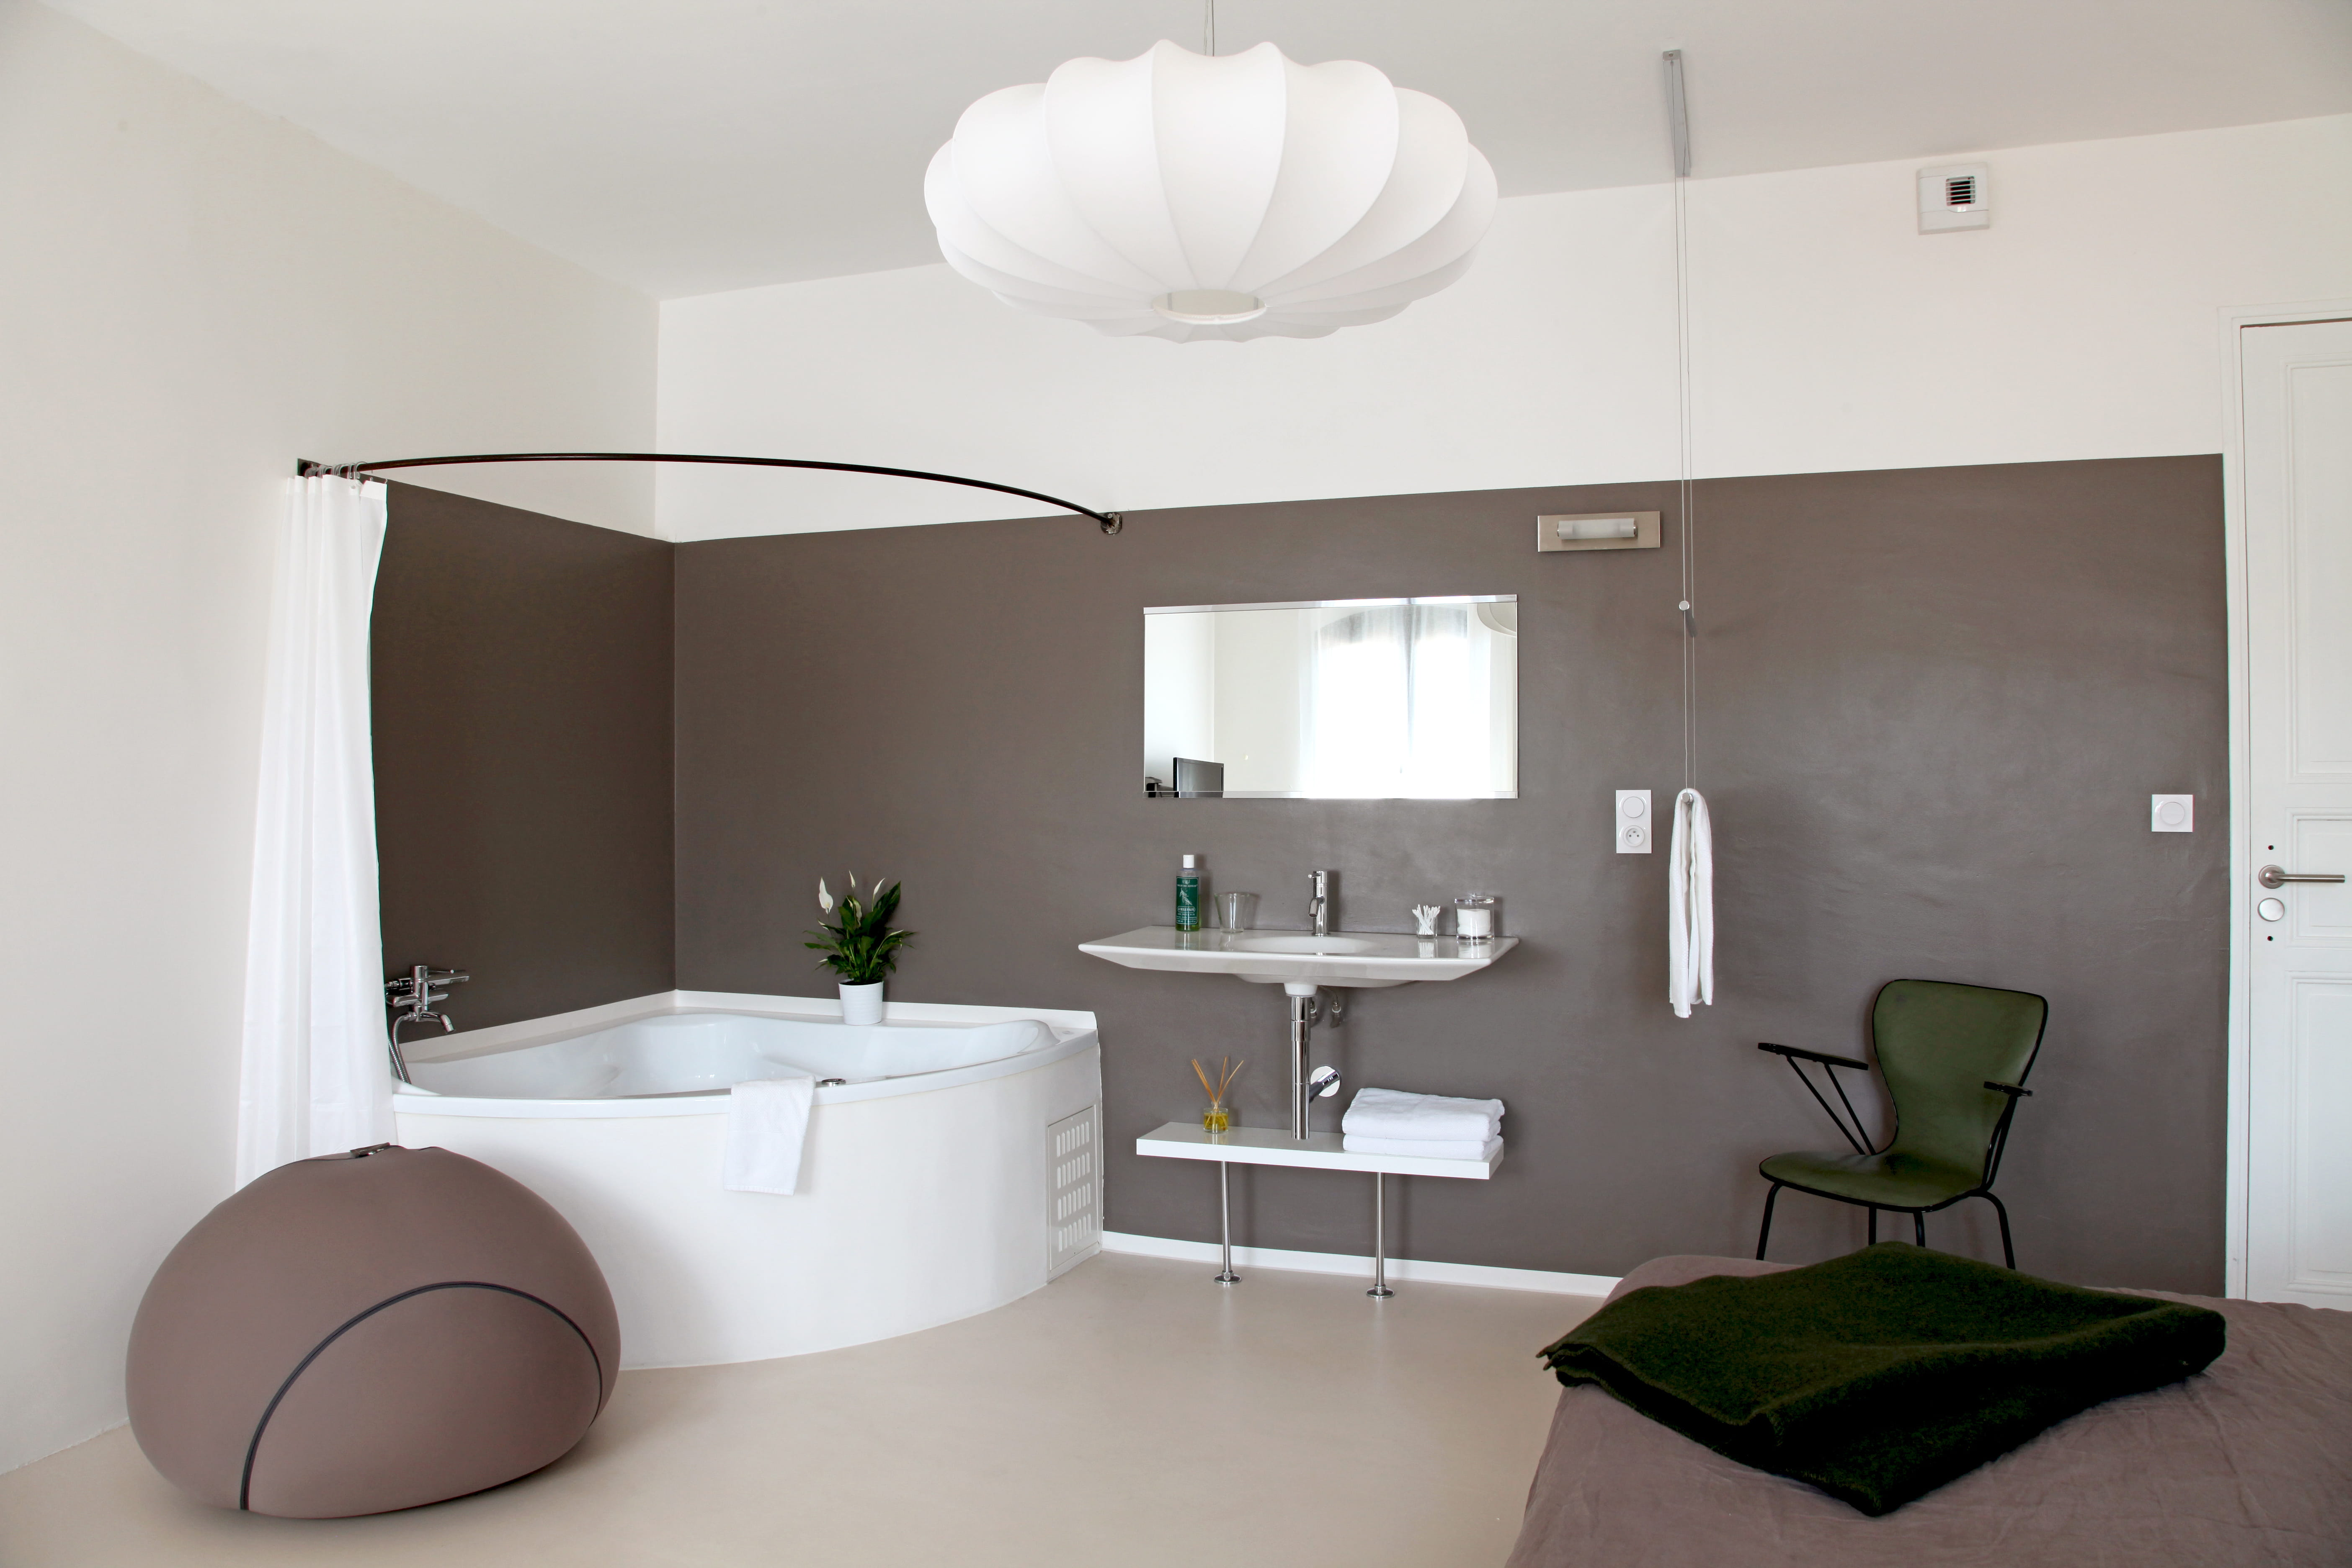 aplat mural taupe murs bicolores 20 id es d. Black Bedroom Furniture Sets. Home Design Ideas